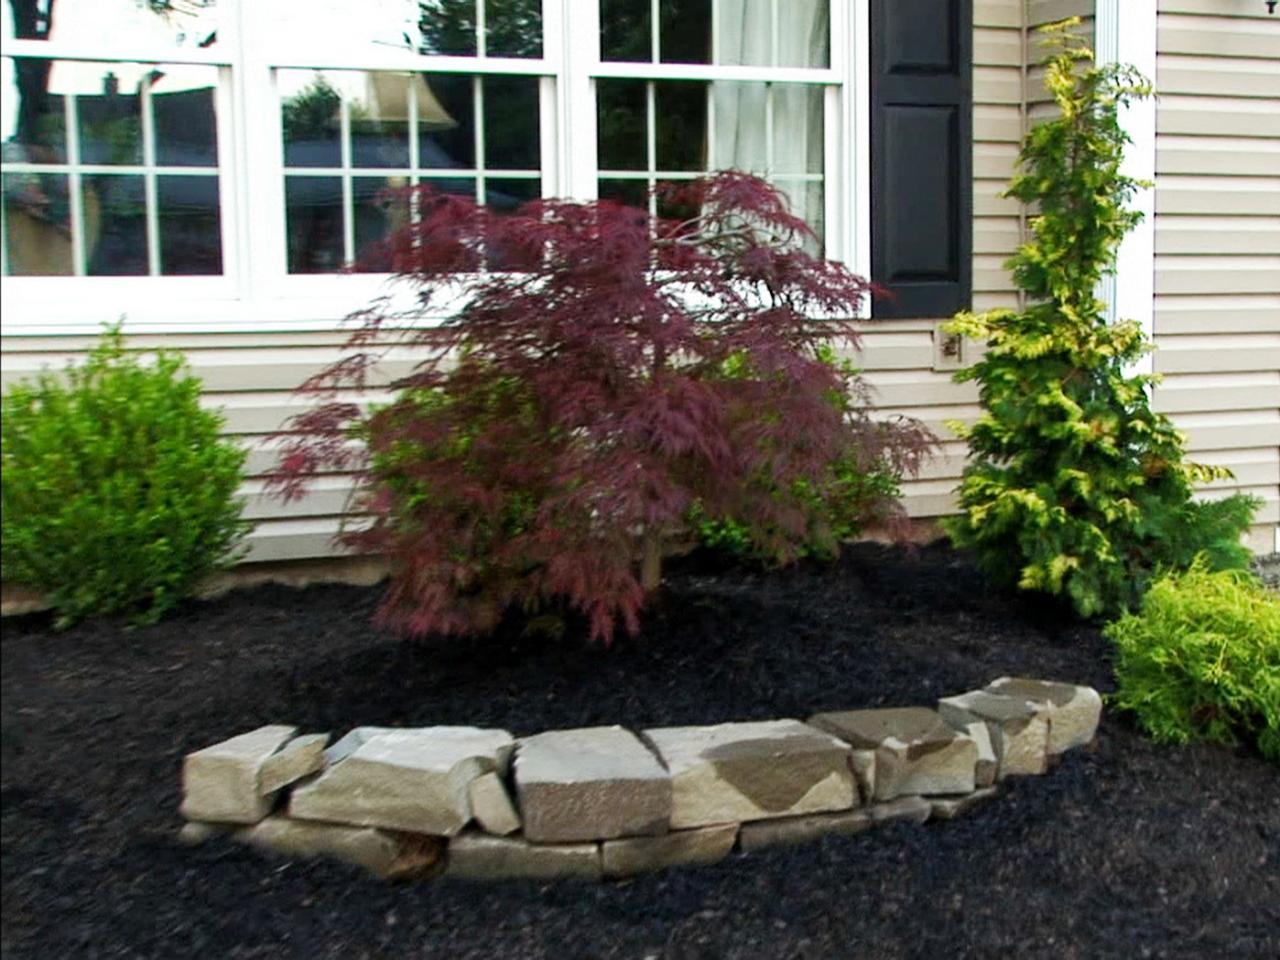 front yard landscaping ideas with rocks rock landscaping ideas | diy FEEZLKN